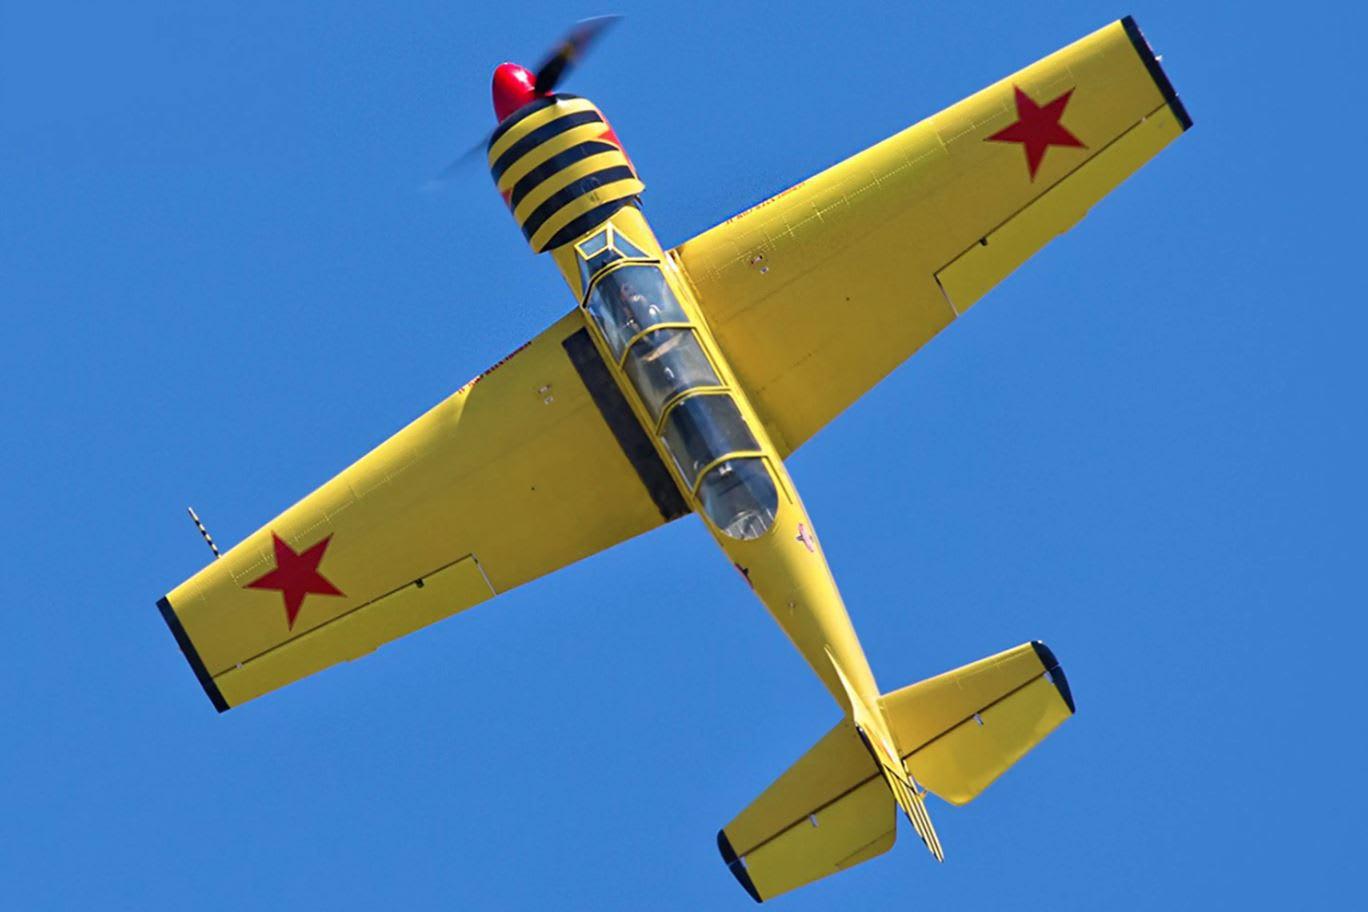 Aerobatics, Yak 52 Extreme Aerobatics, 30-minutes - Hunter Valley, Weekend